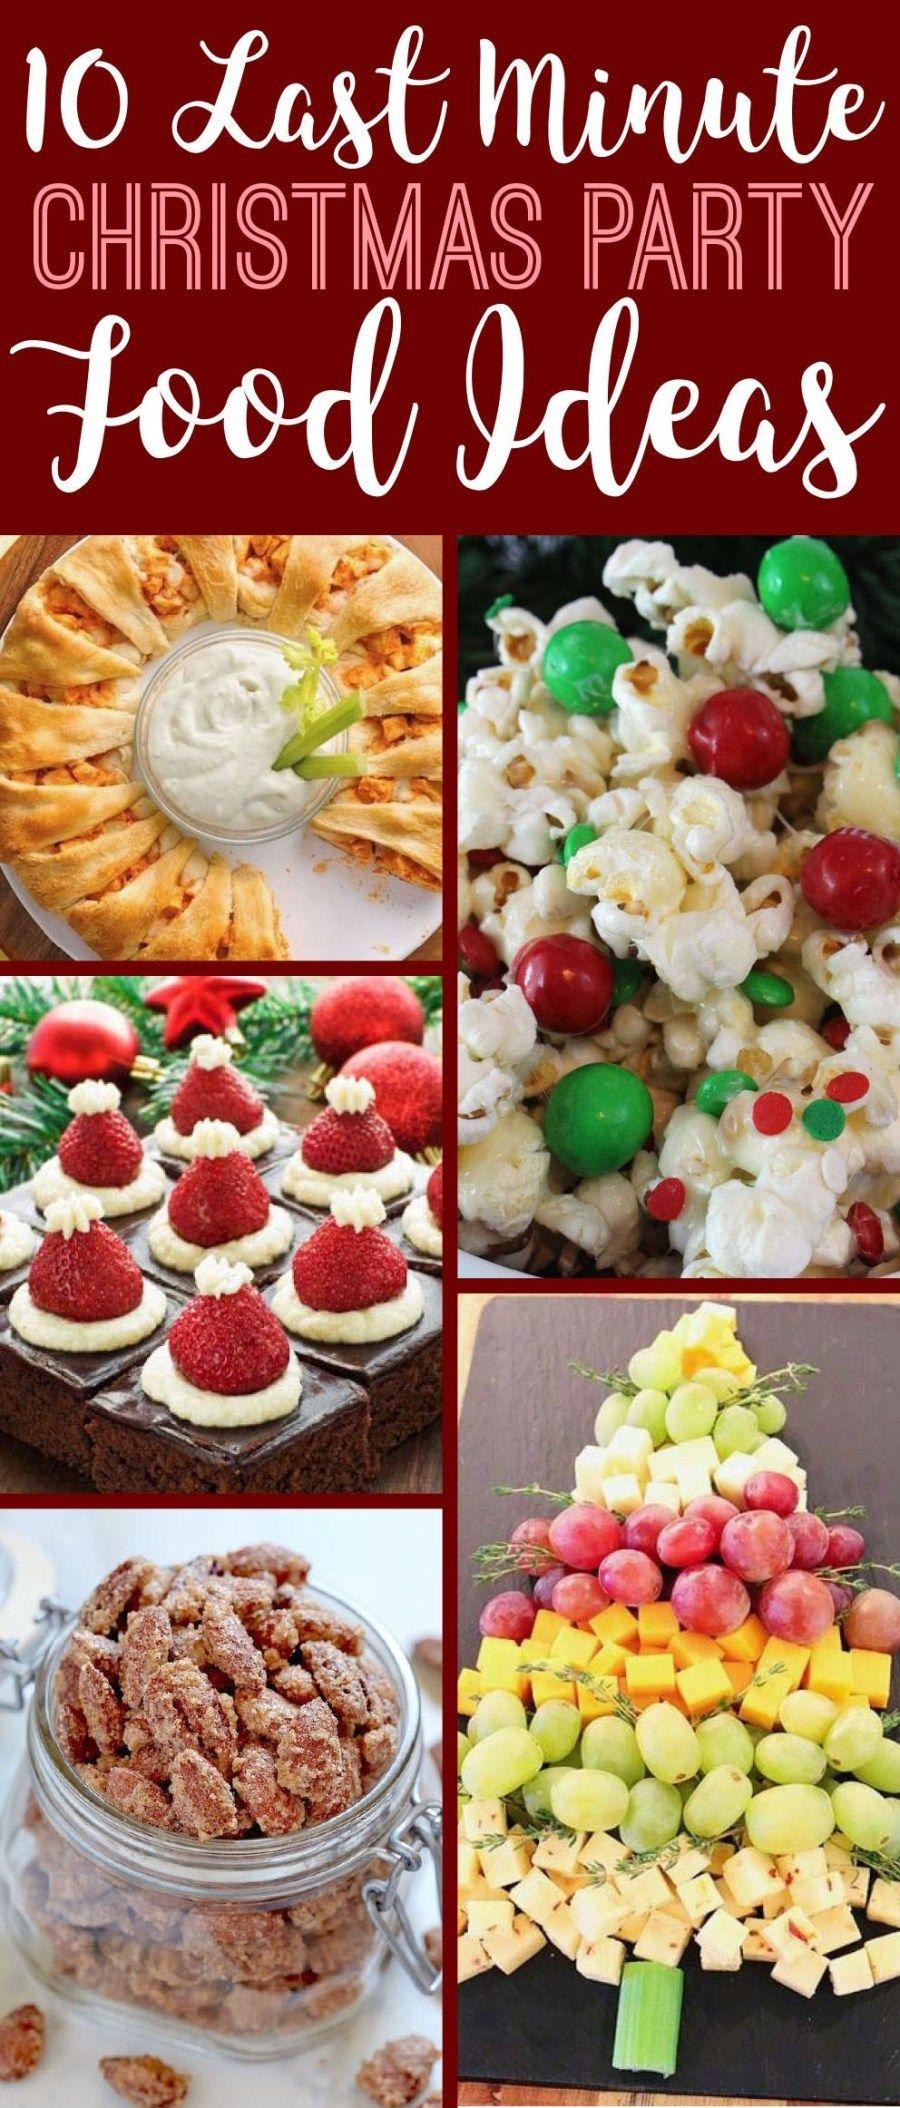 10 Last Minute Christmas Party Food Ideas - Society19